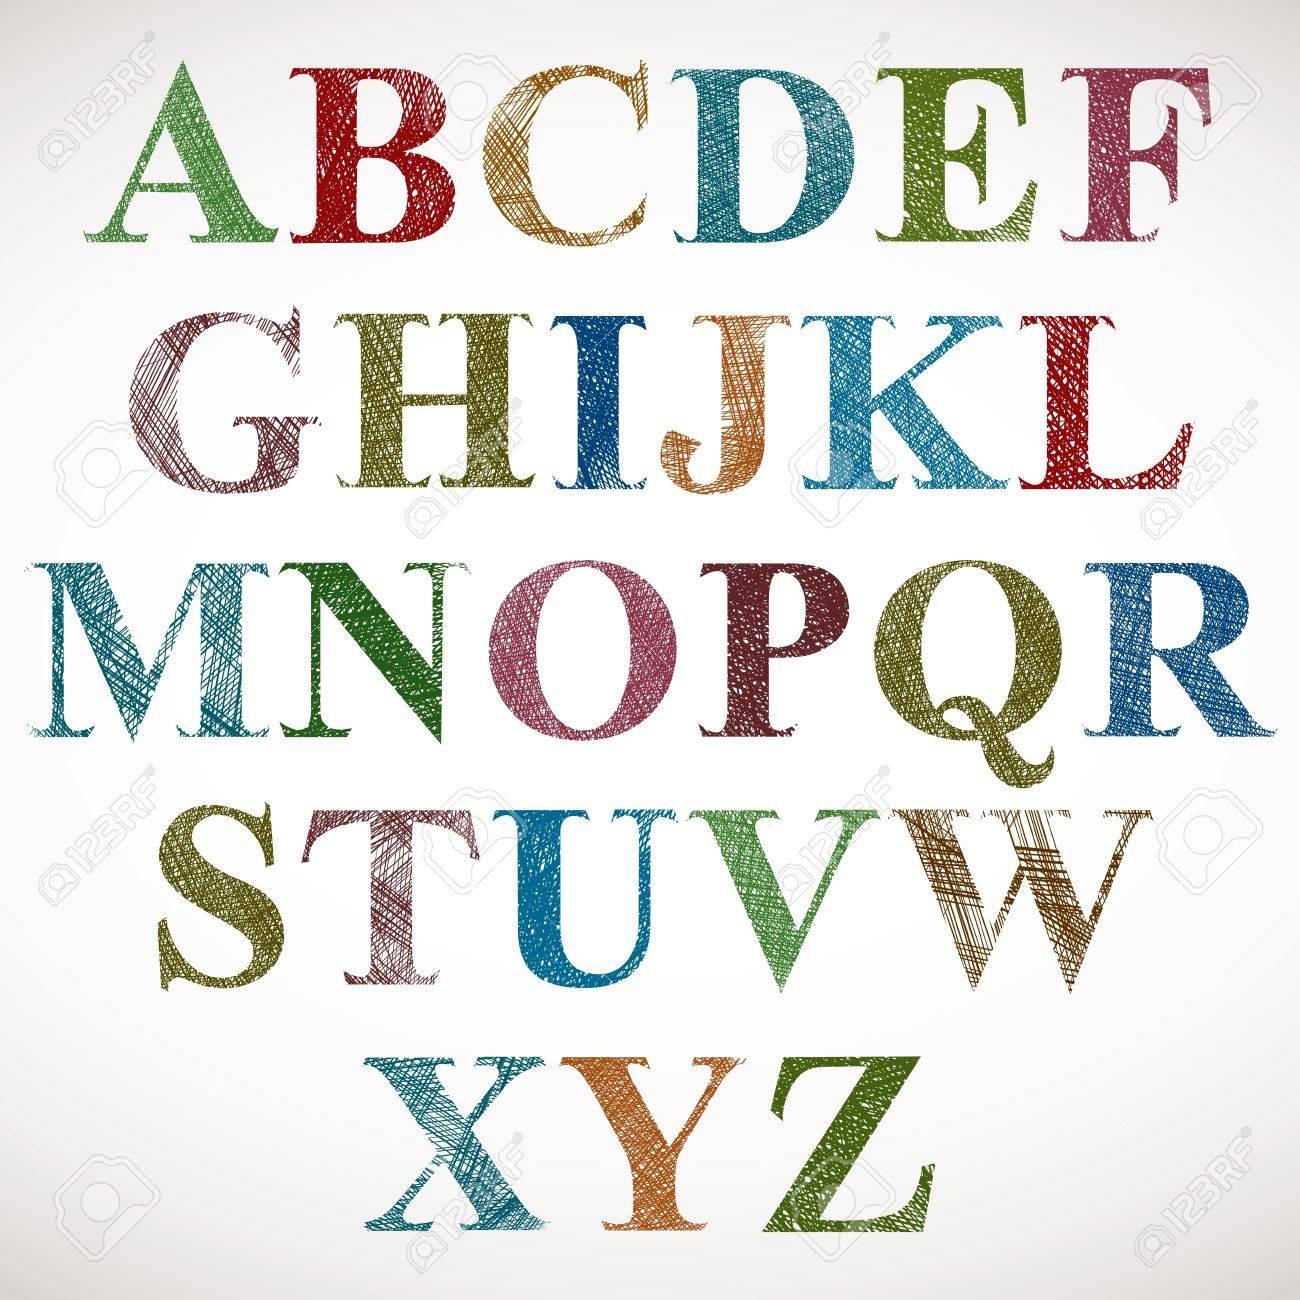 Vintage style alphabet. Stock Vector - 15275361